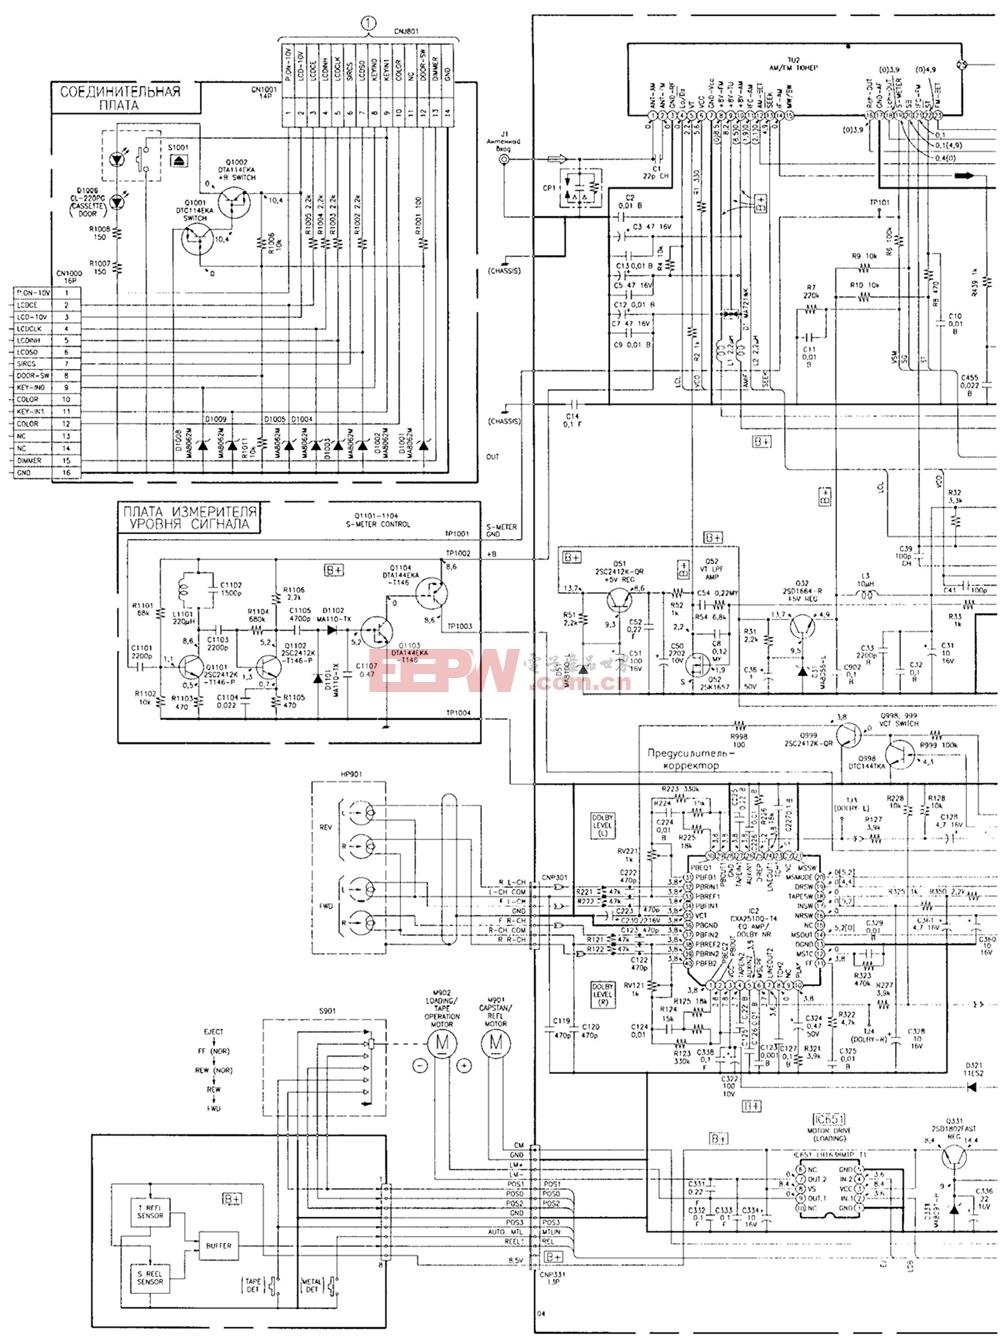 sony xr-c503汽车音响电路图纸